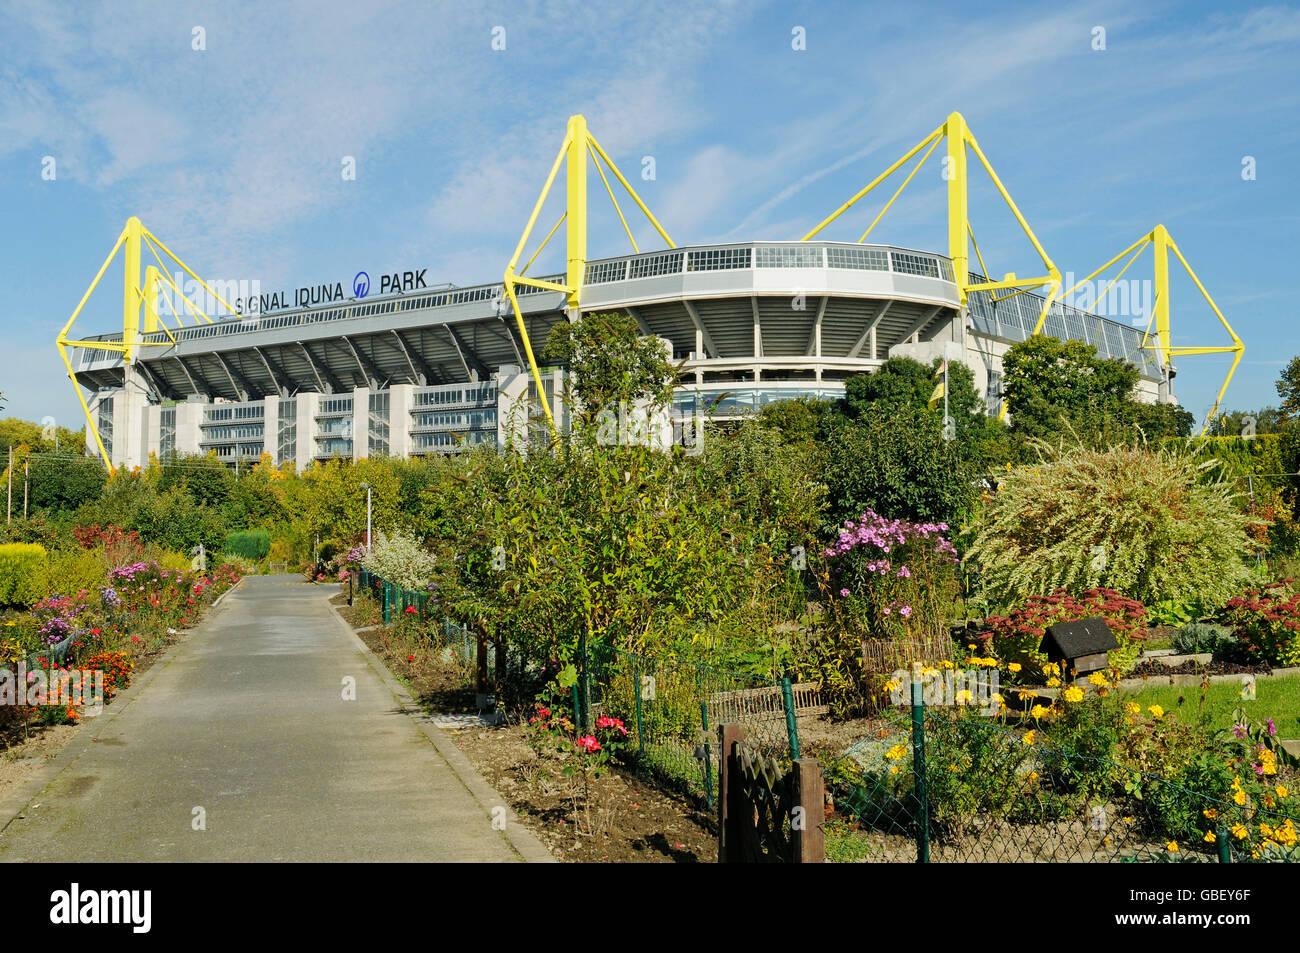 Signal Iduna Park, Westfalenstadion, stadium, BVB, Borussia, football stadium, allotment garden area, Dortmund, - Stock Image